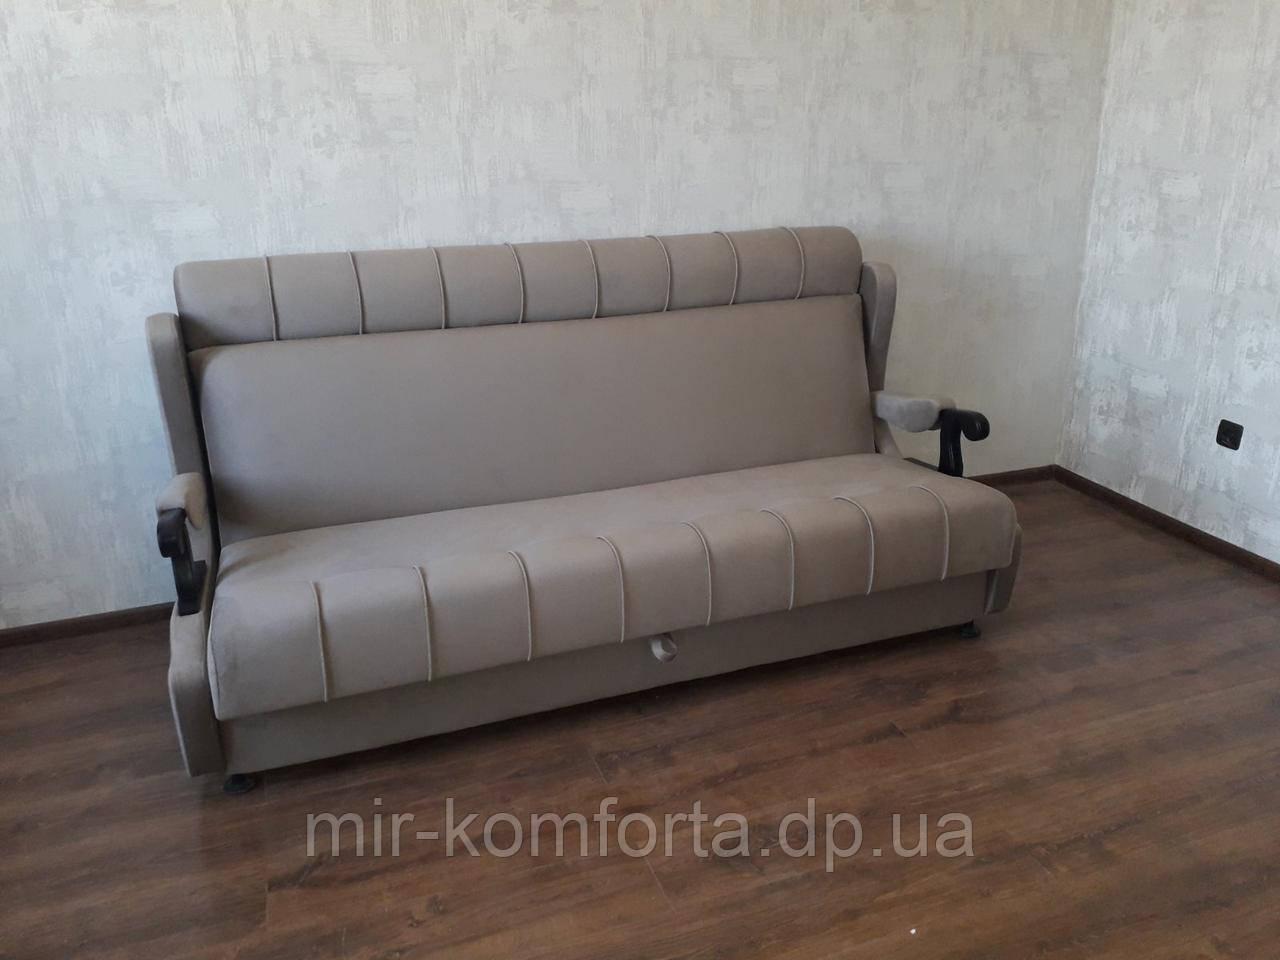 Перетяжка невеликого дивану